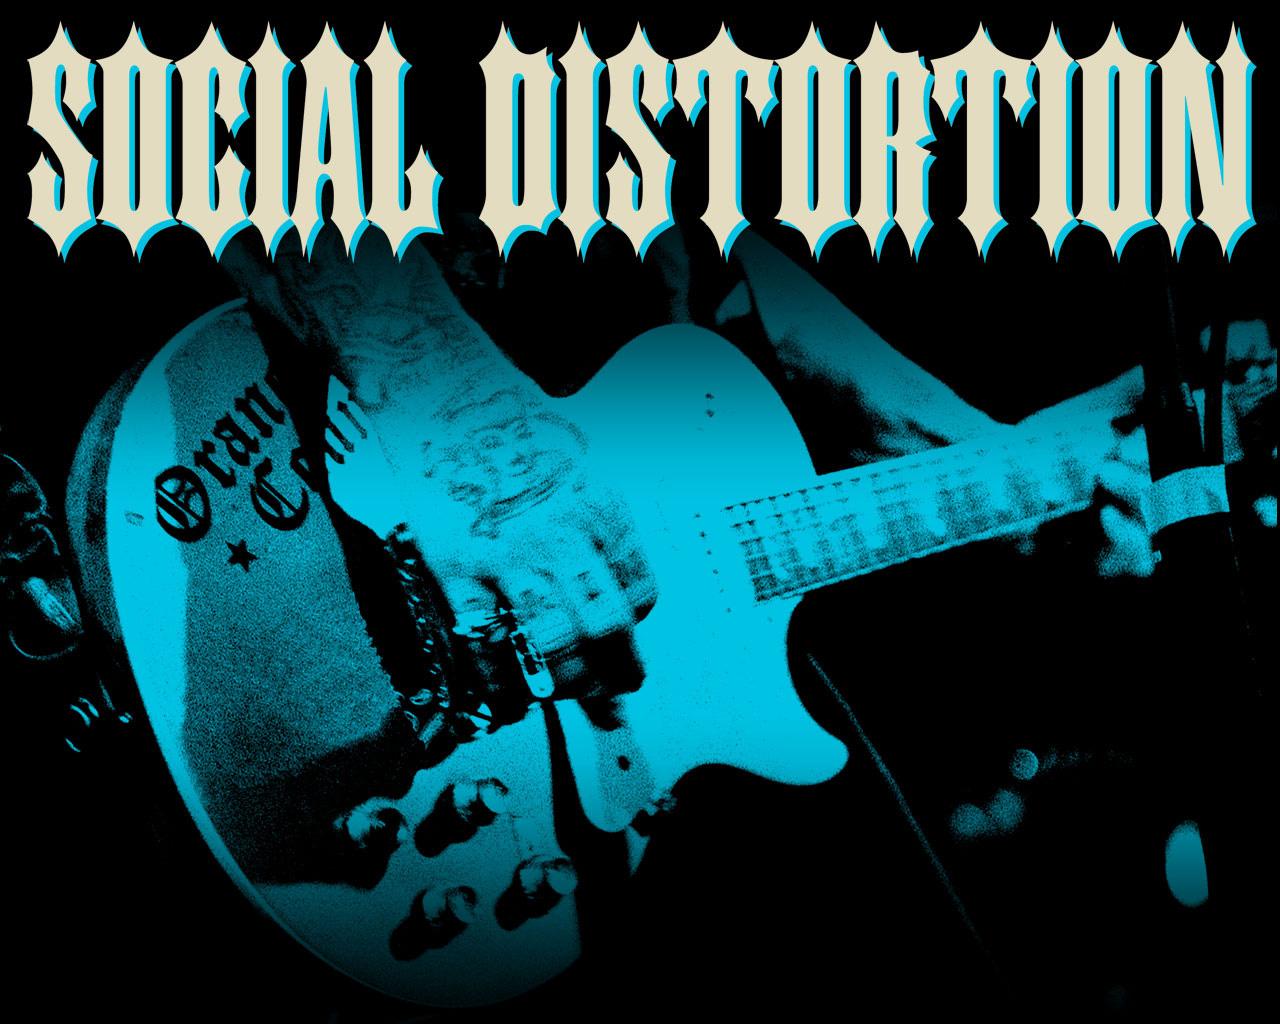 Music   Social Distortion Wallpaper 1280x1024